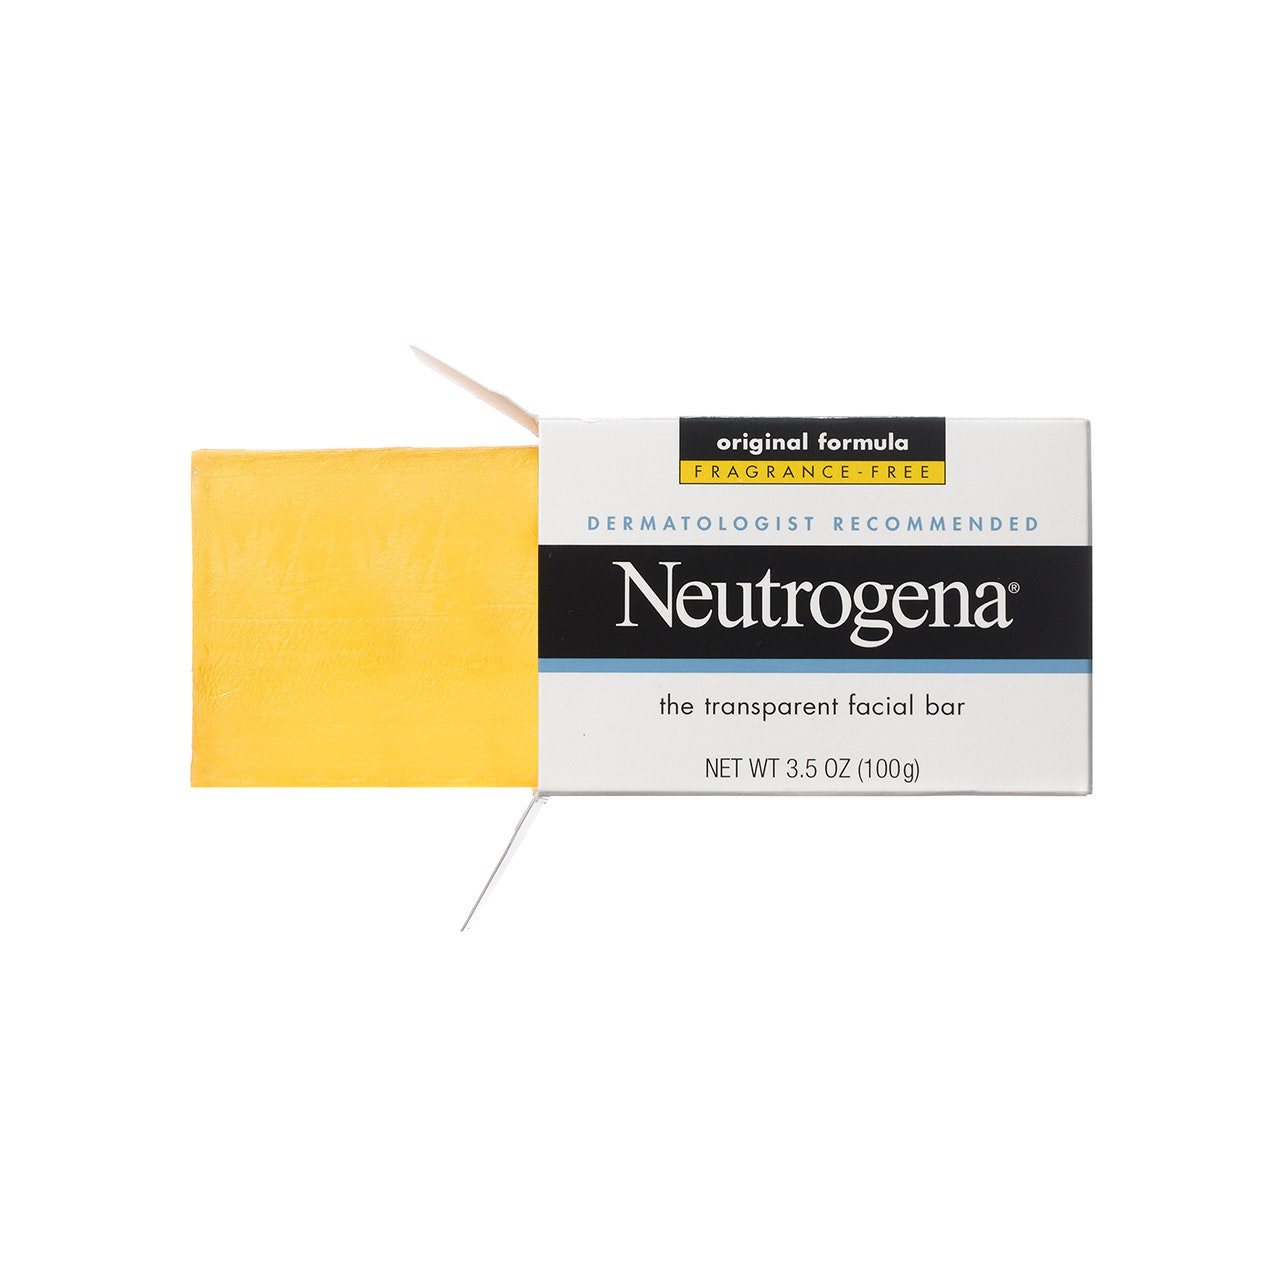 neutrogena face soap bar review